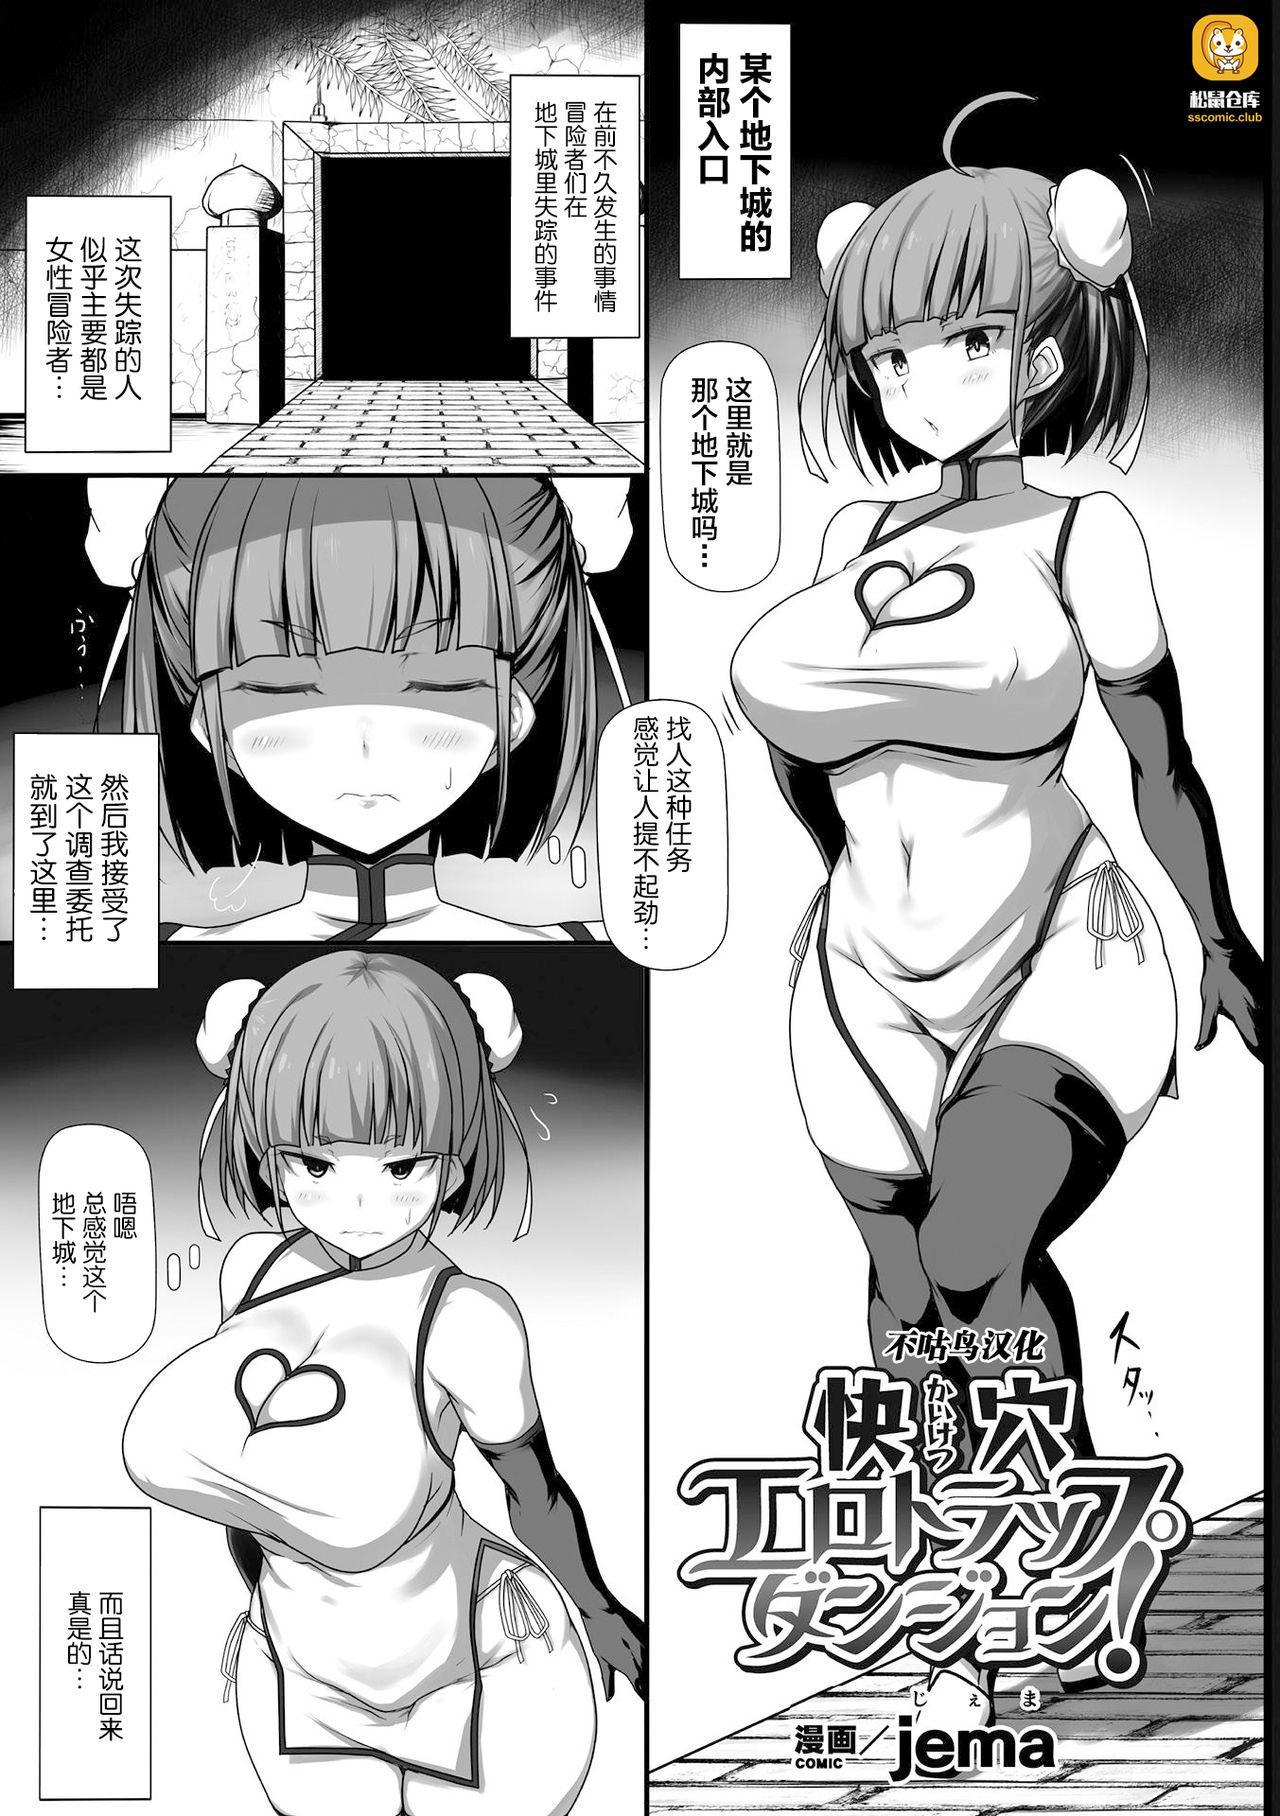 2D Comic Magazine Zecchou Kairaku ga Tomaranai Ero-Trap Dungeon Vol. 1 4